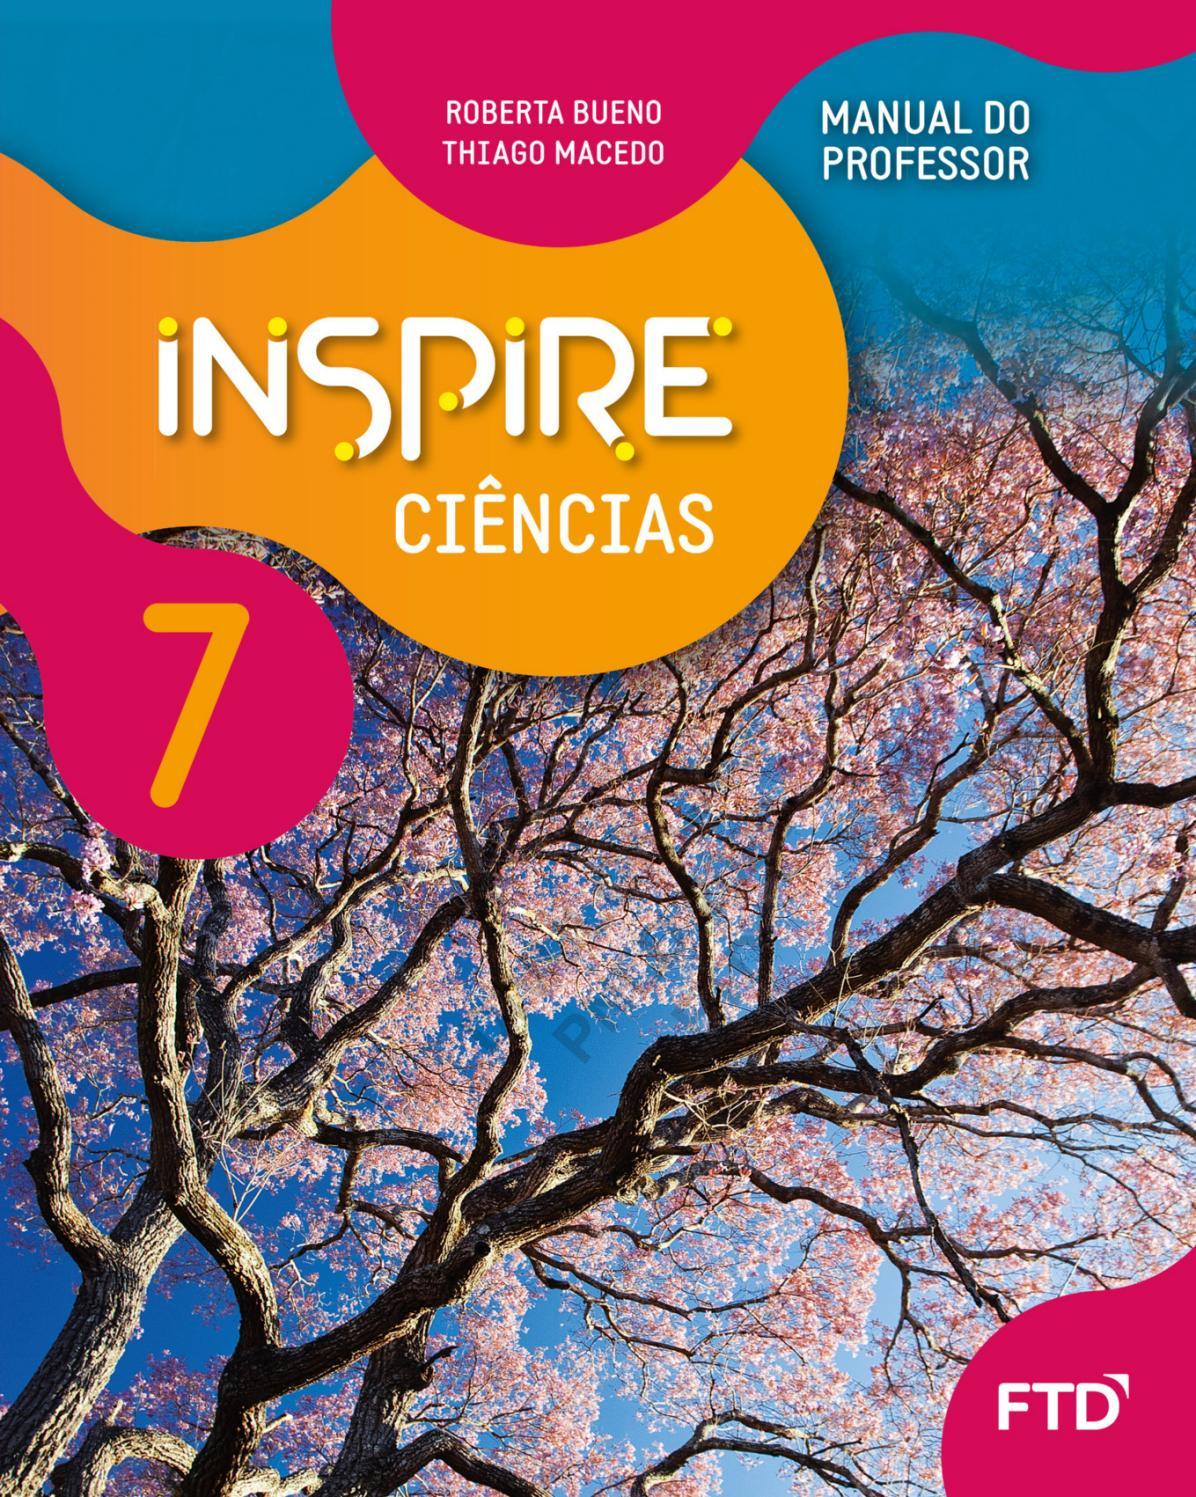 Ciencias Inspire 7 By Editora Ftd Issuu